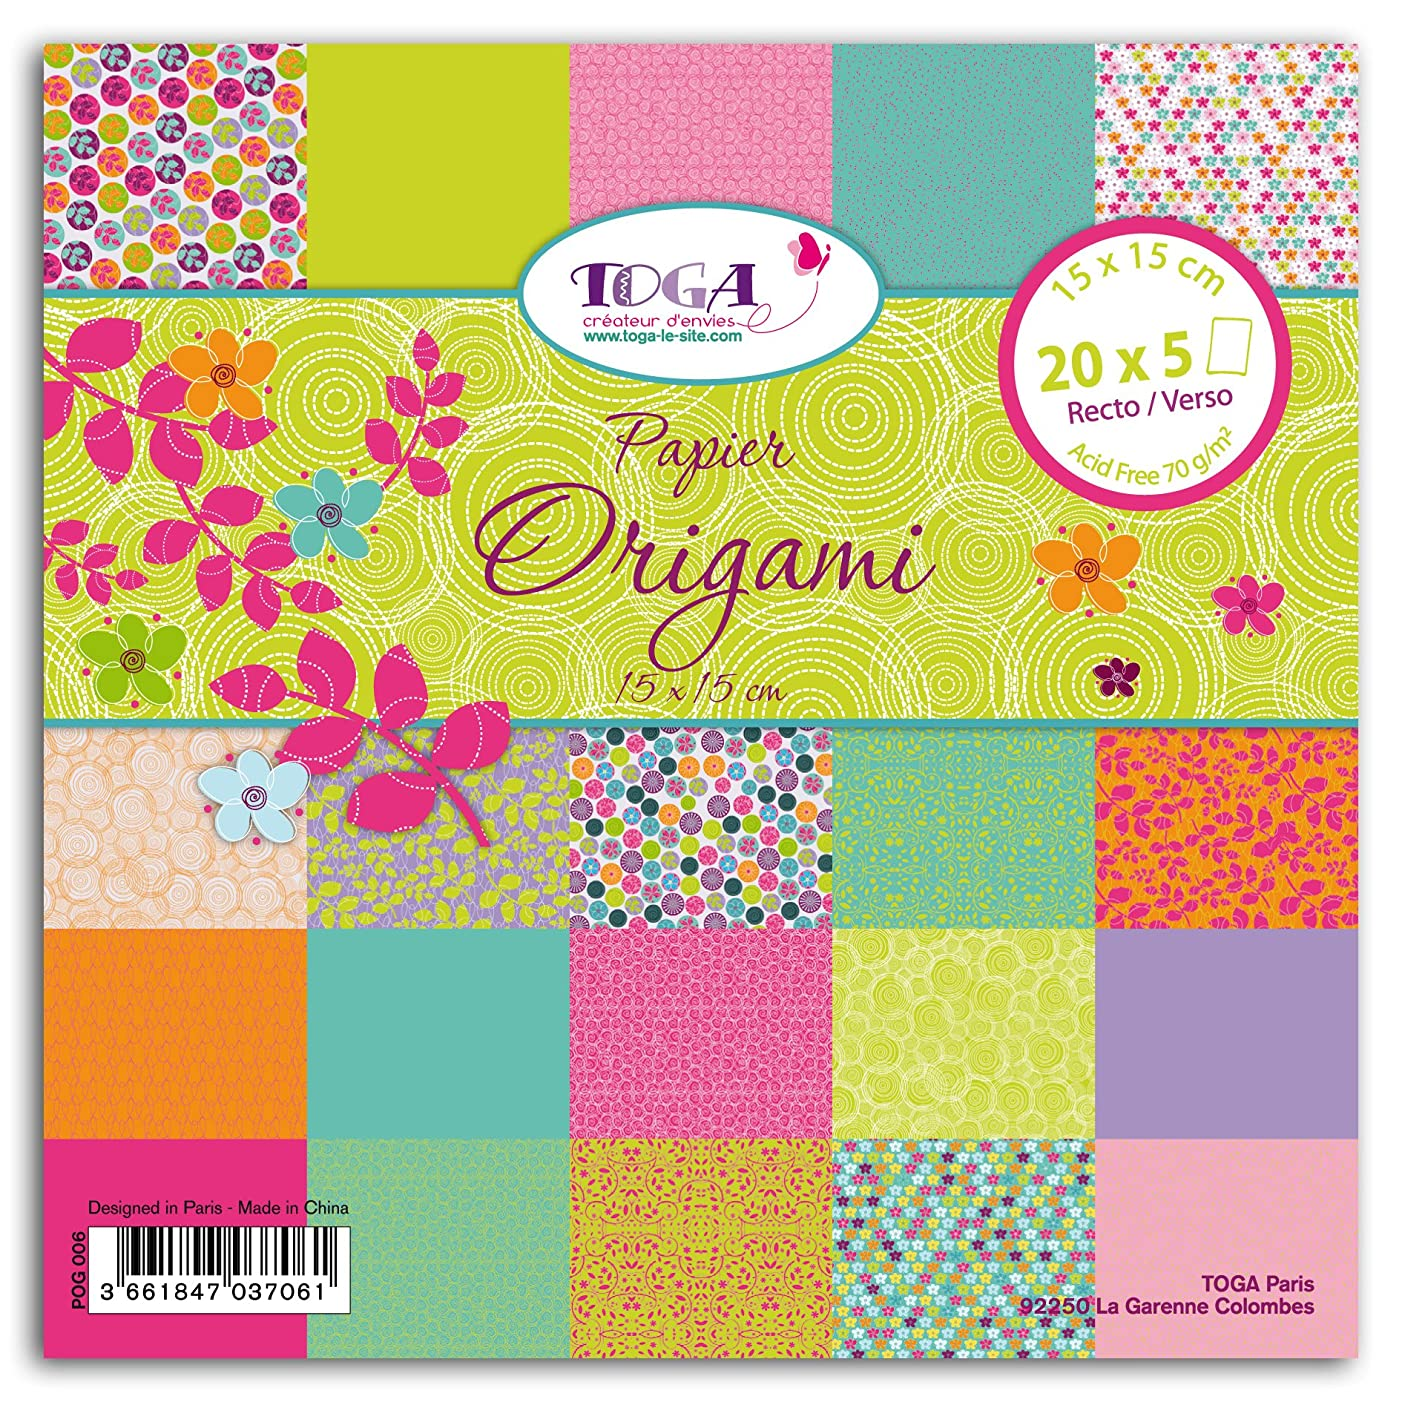 Toga pog006?Sweet Pea 100?Sheets Origami Paper 15?x 15?x 1?cm Multi-Coloured